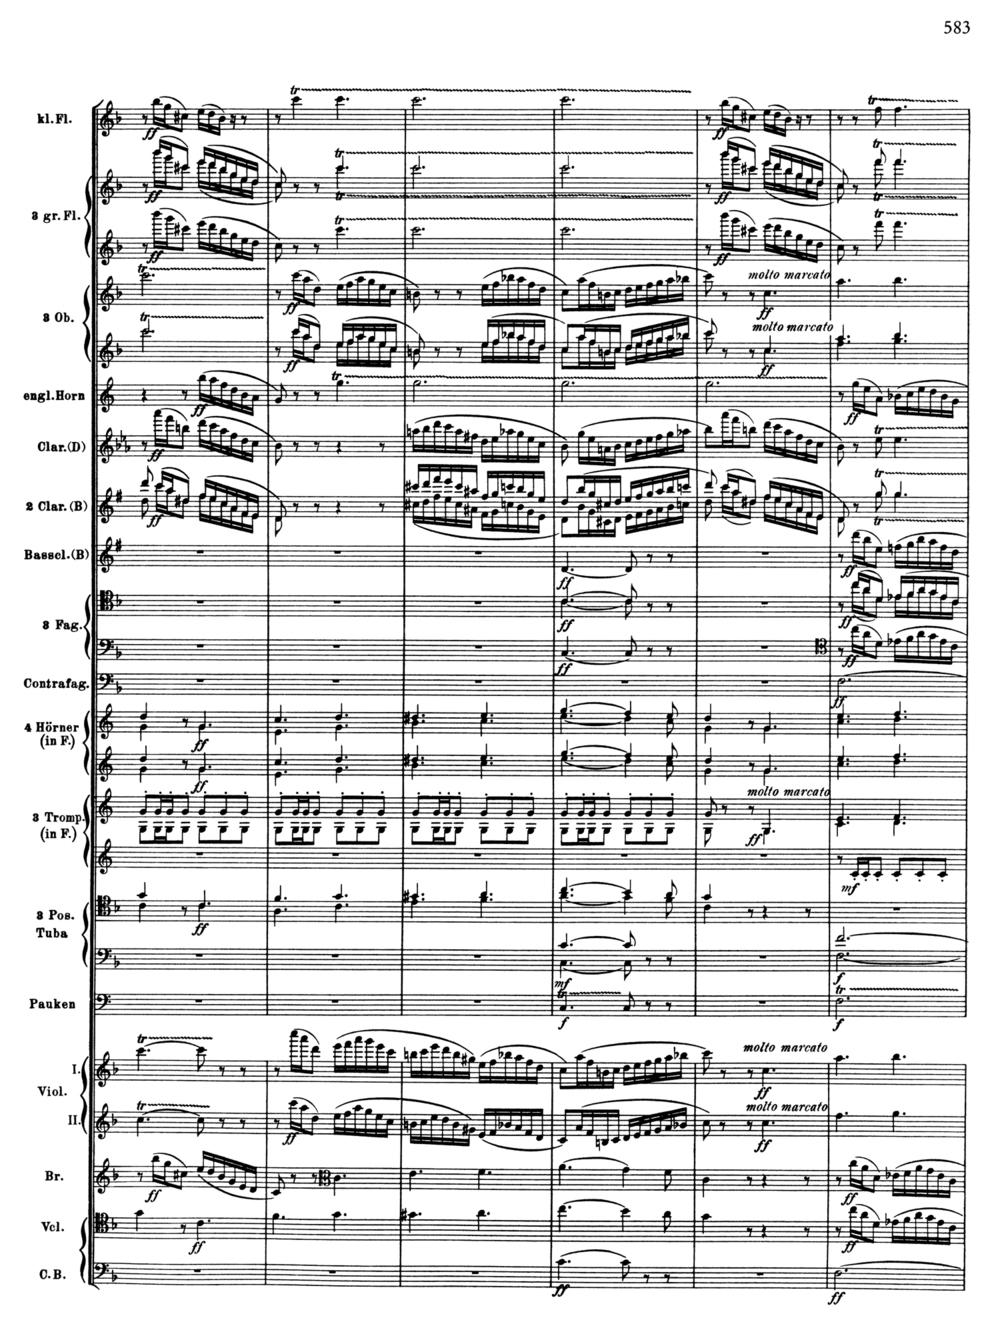 Strauss Till Eulenspiegel Score 1.jpg